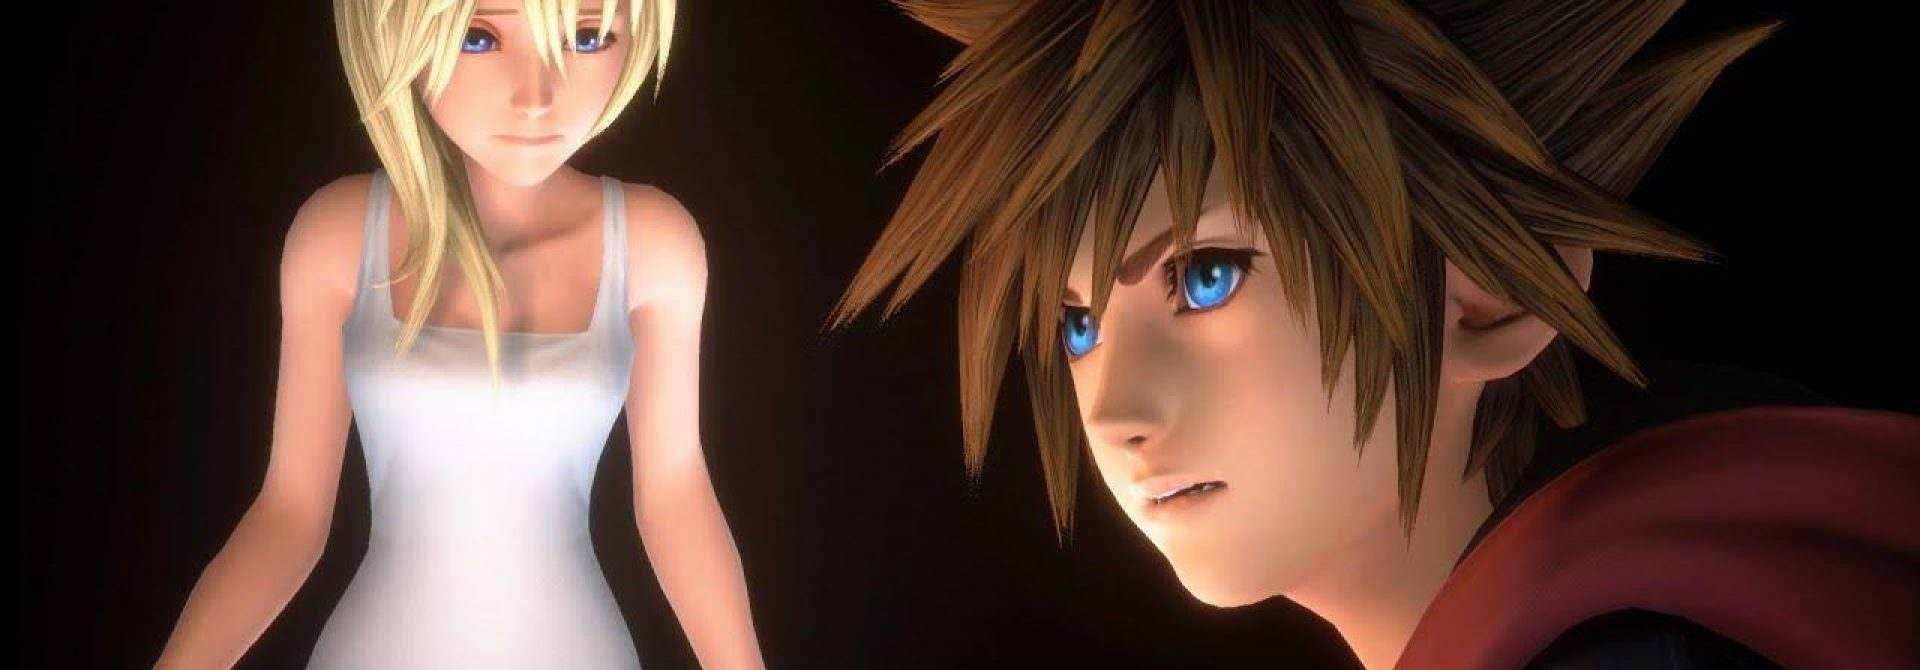 New Kingdom Hearts 3 Re Mind TGS Trailer